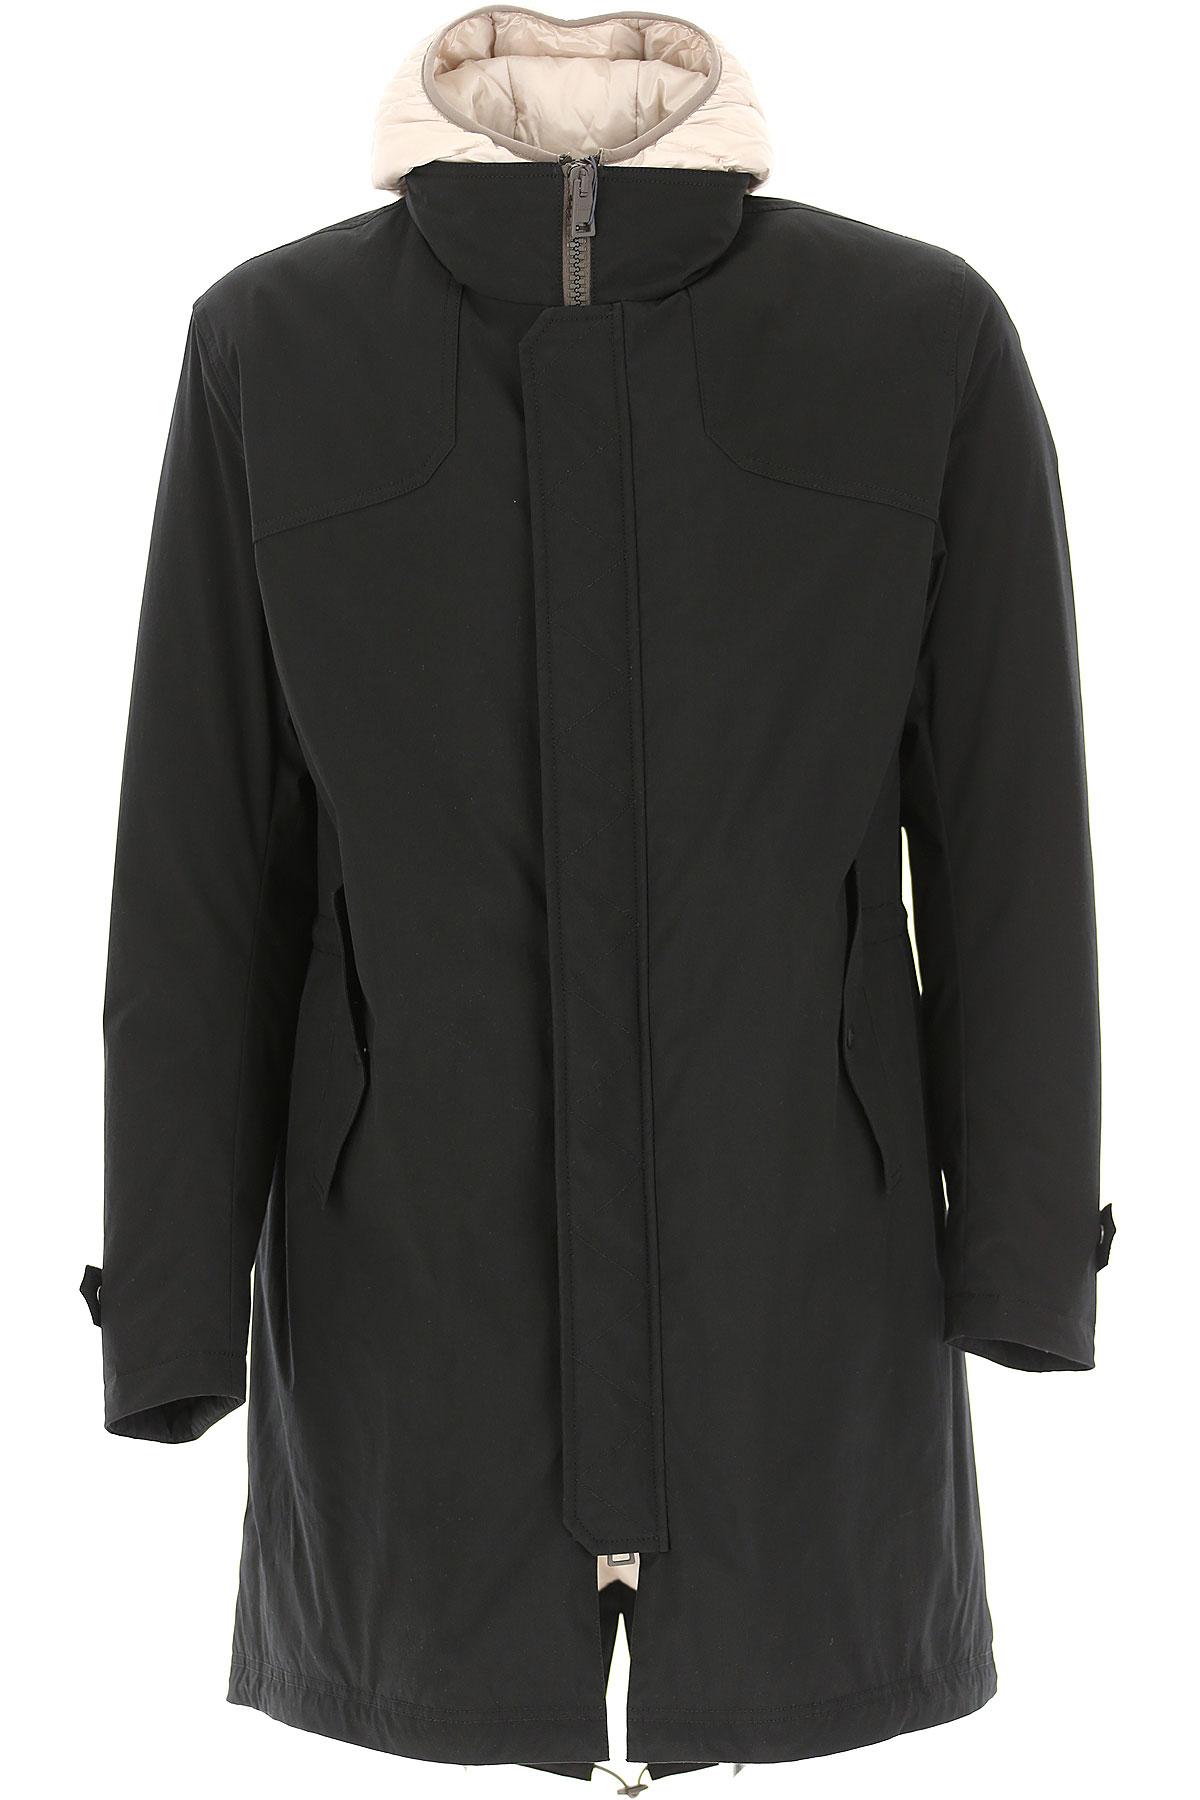 Herno Down Jacket for Men, Puffer Ski Jacket On Sale, Black, Down, 2019, L M XL